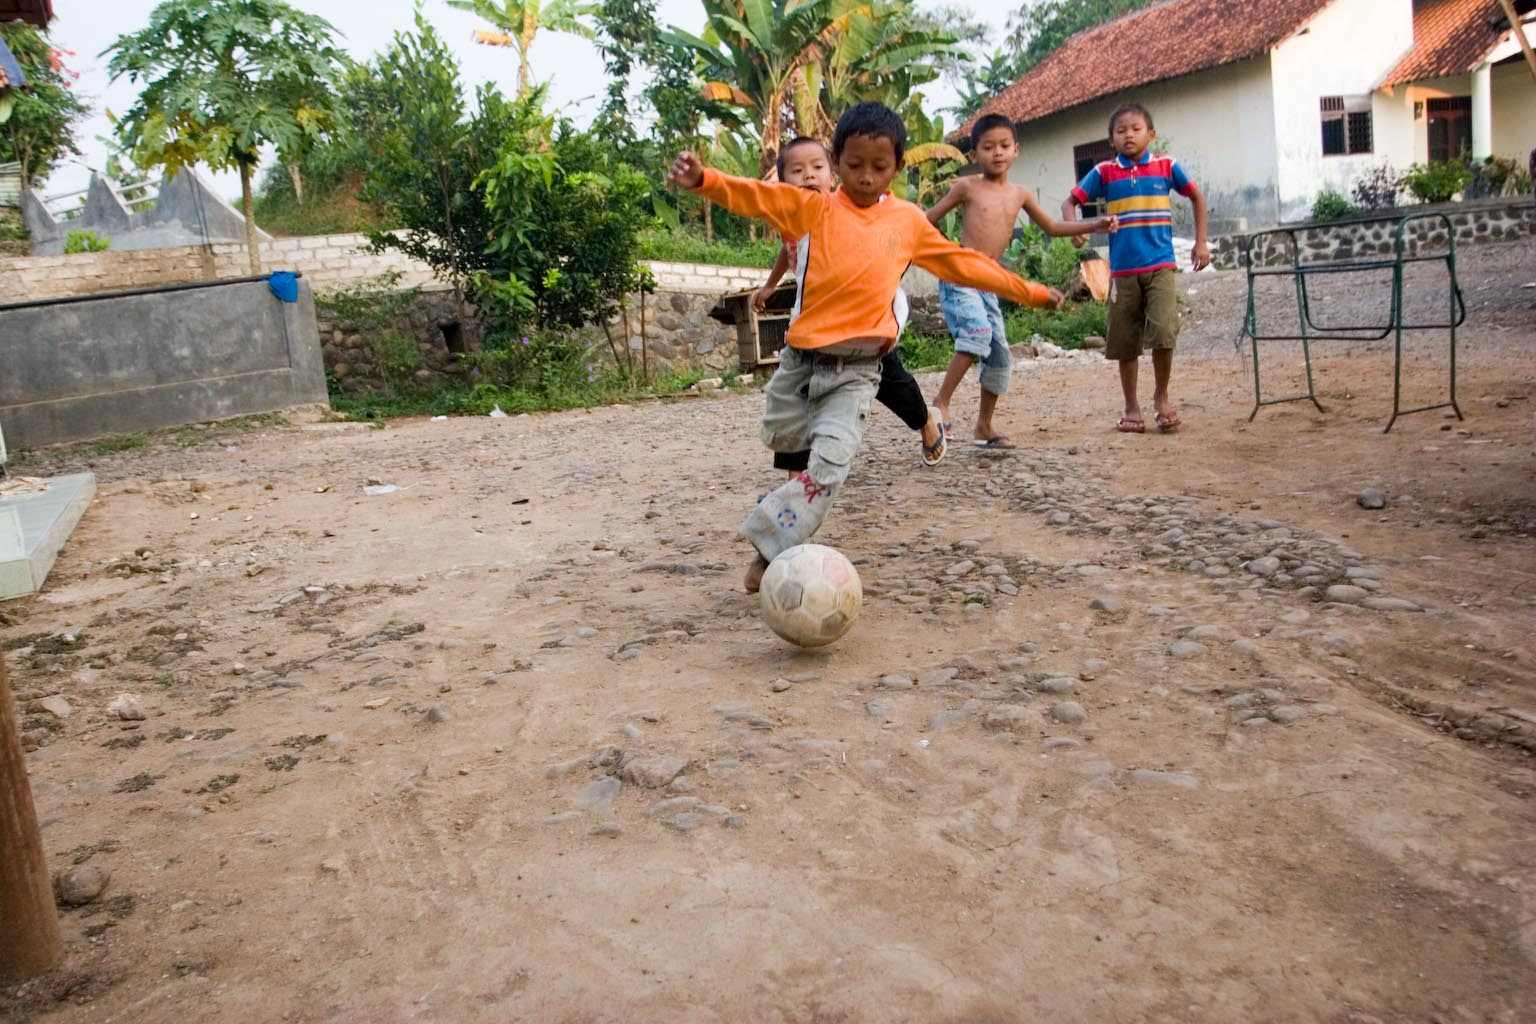 Soccer Programs Addressing Global Poverty